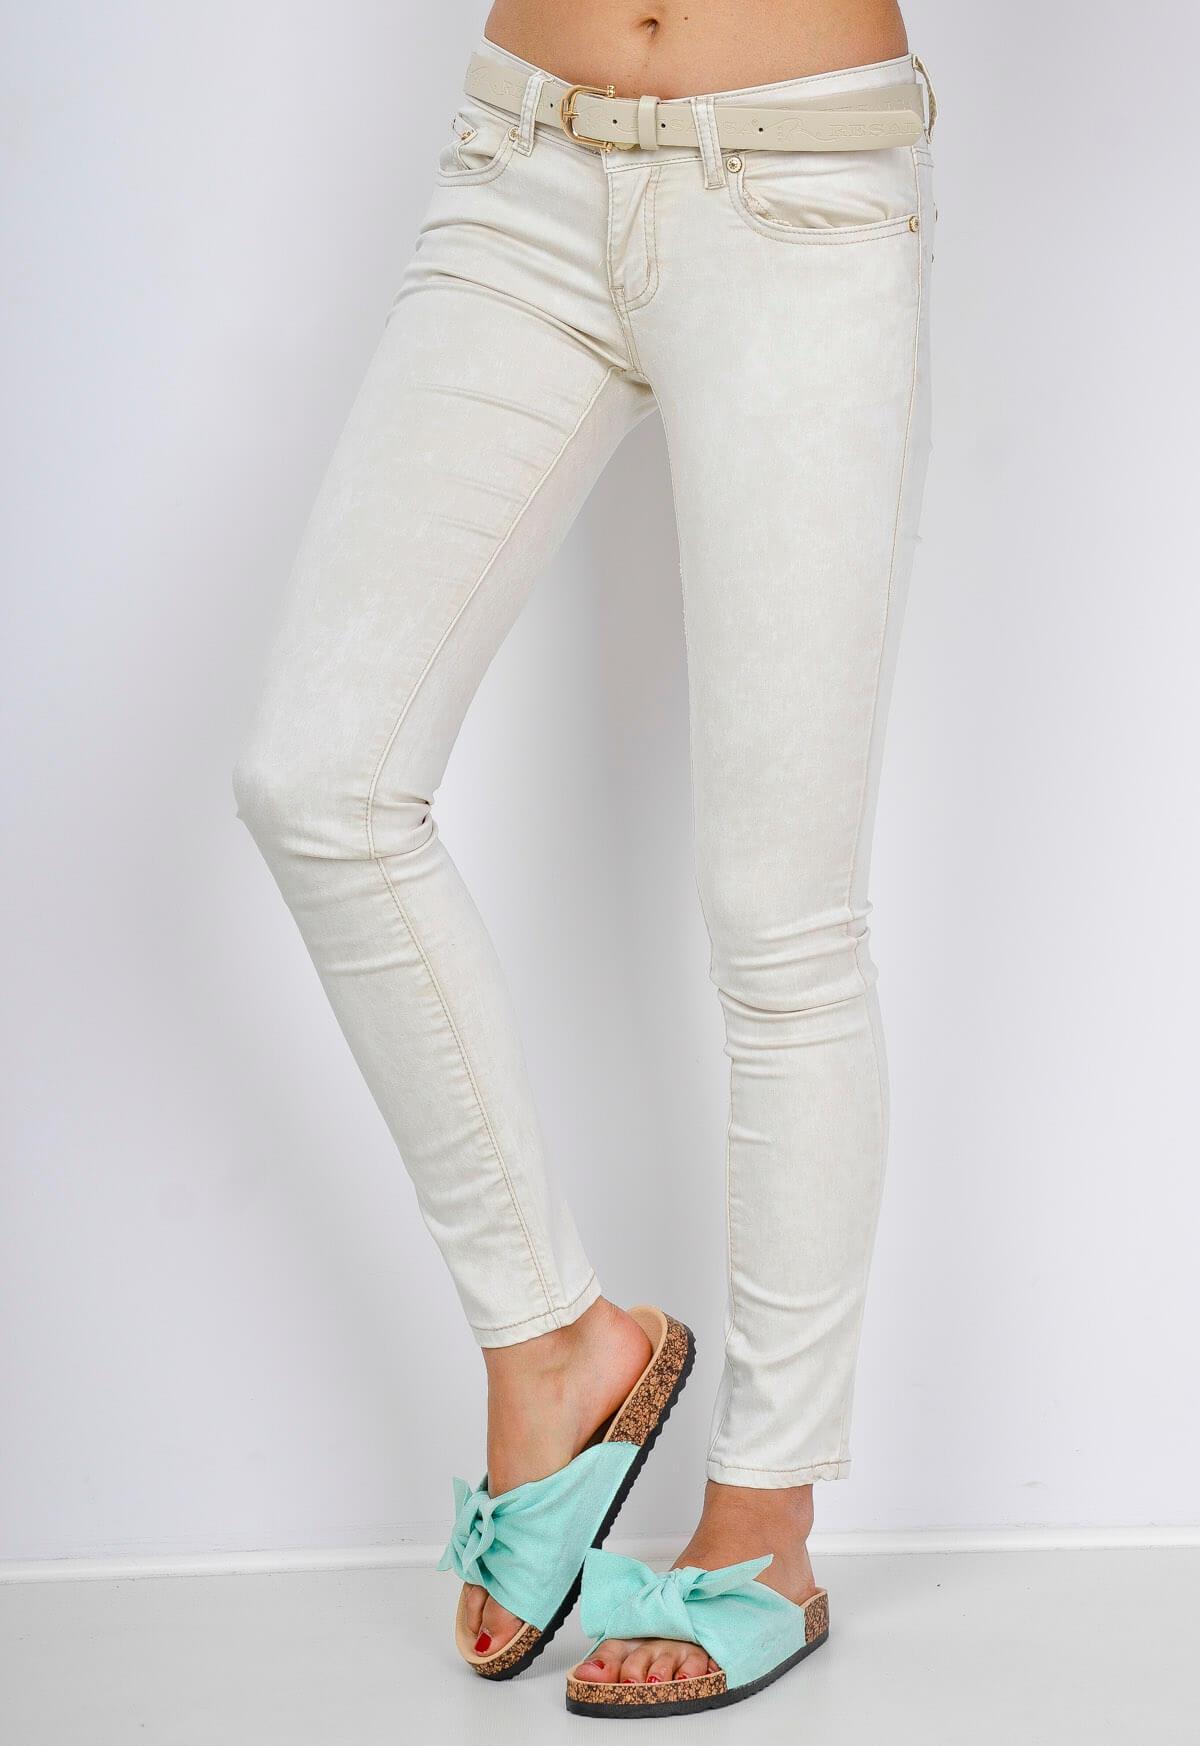 Dámské mramorované barevné džíny s opaskem